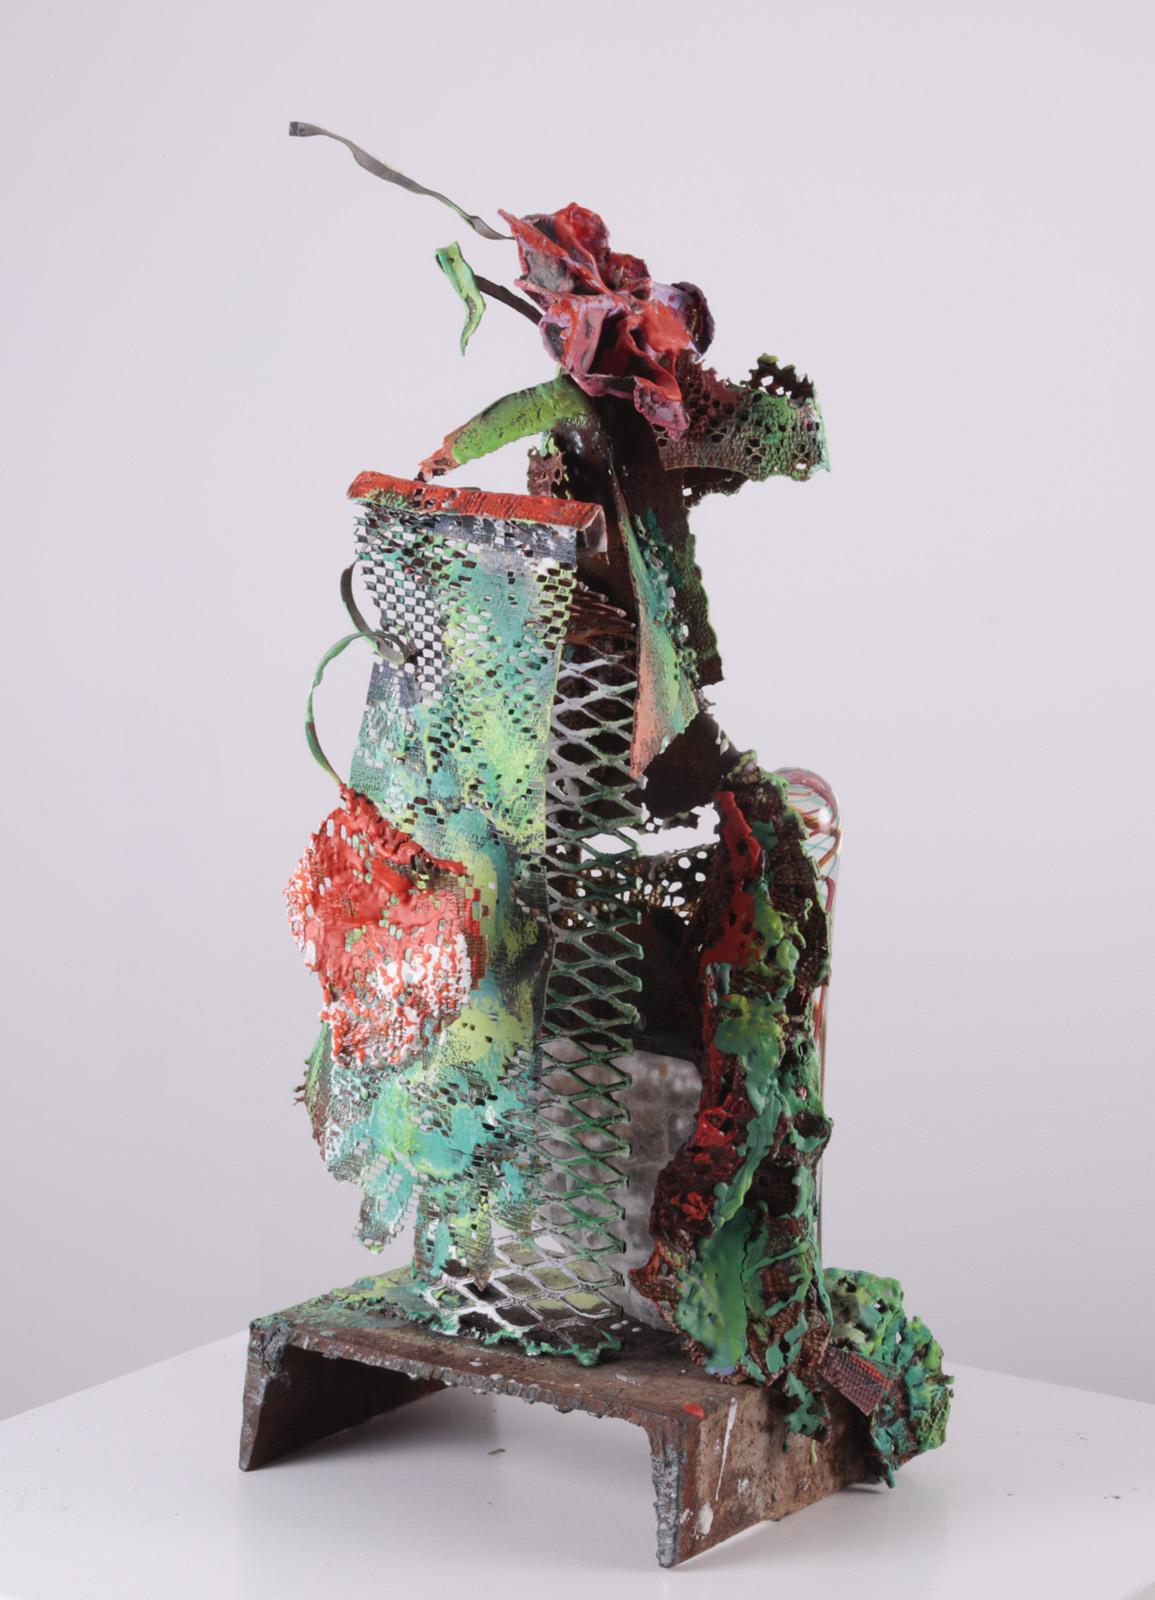 Darlington_LikeFlower_Sculpture2.jpeg